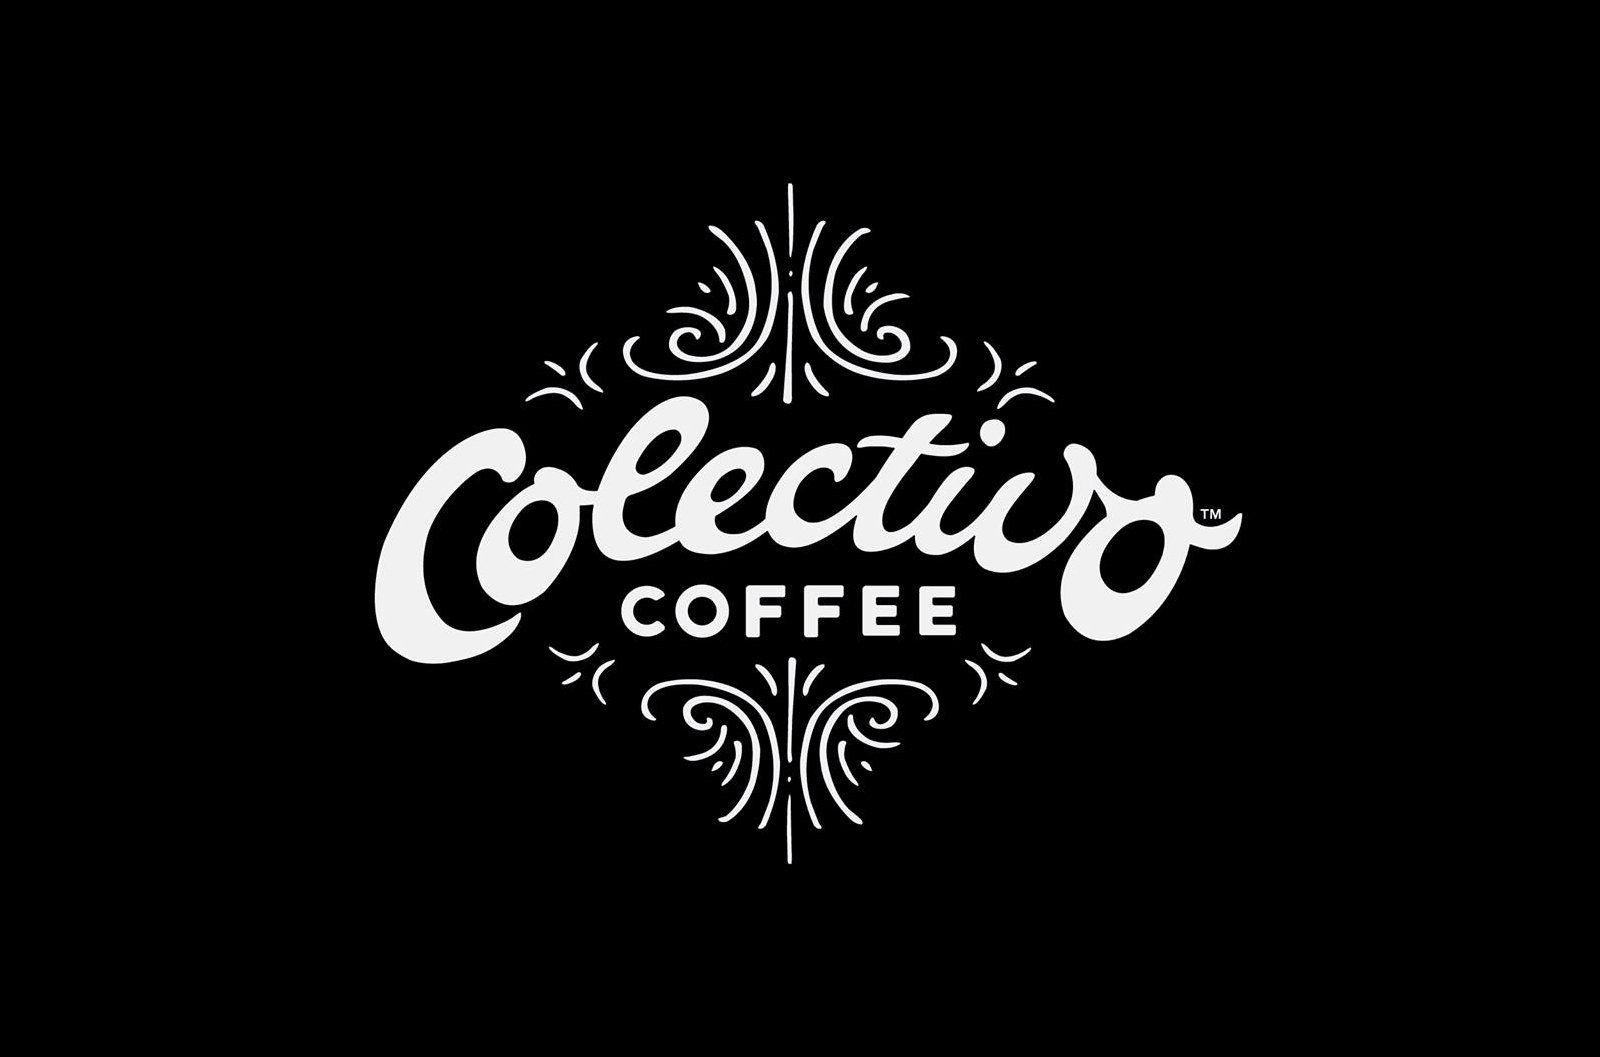 Art logo logo s coffee logo coffee shop coffee design shop logo coffee - Logo Colectivo Coffee Logo 1 Designed By Unknown